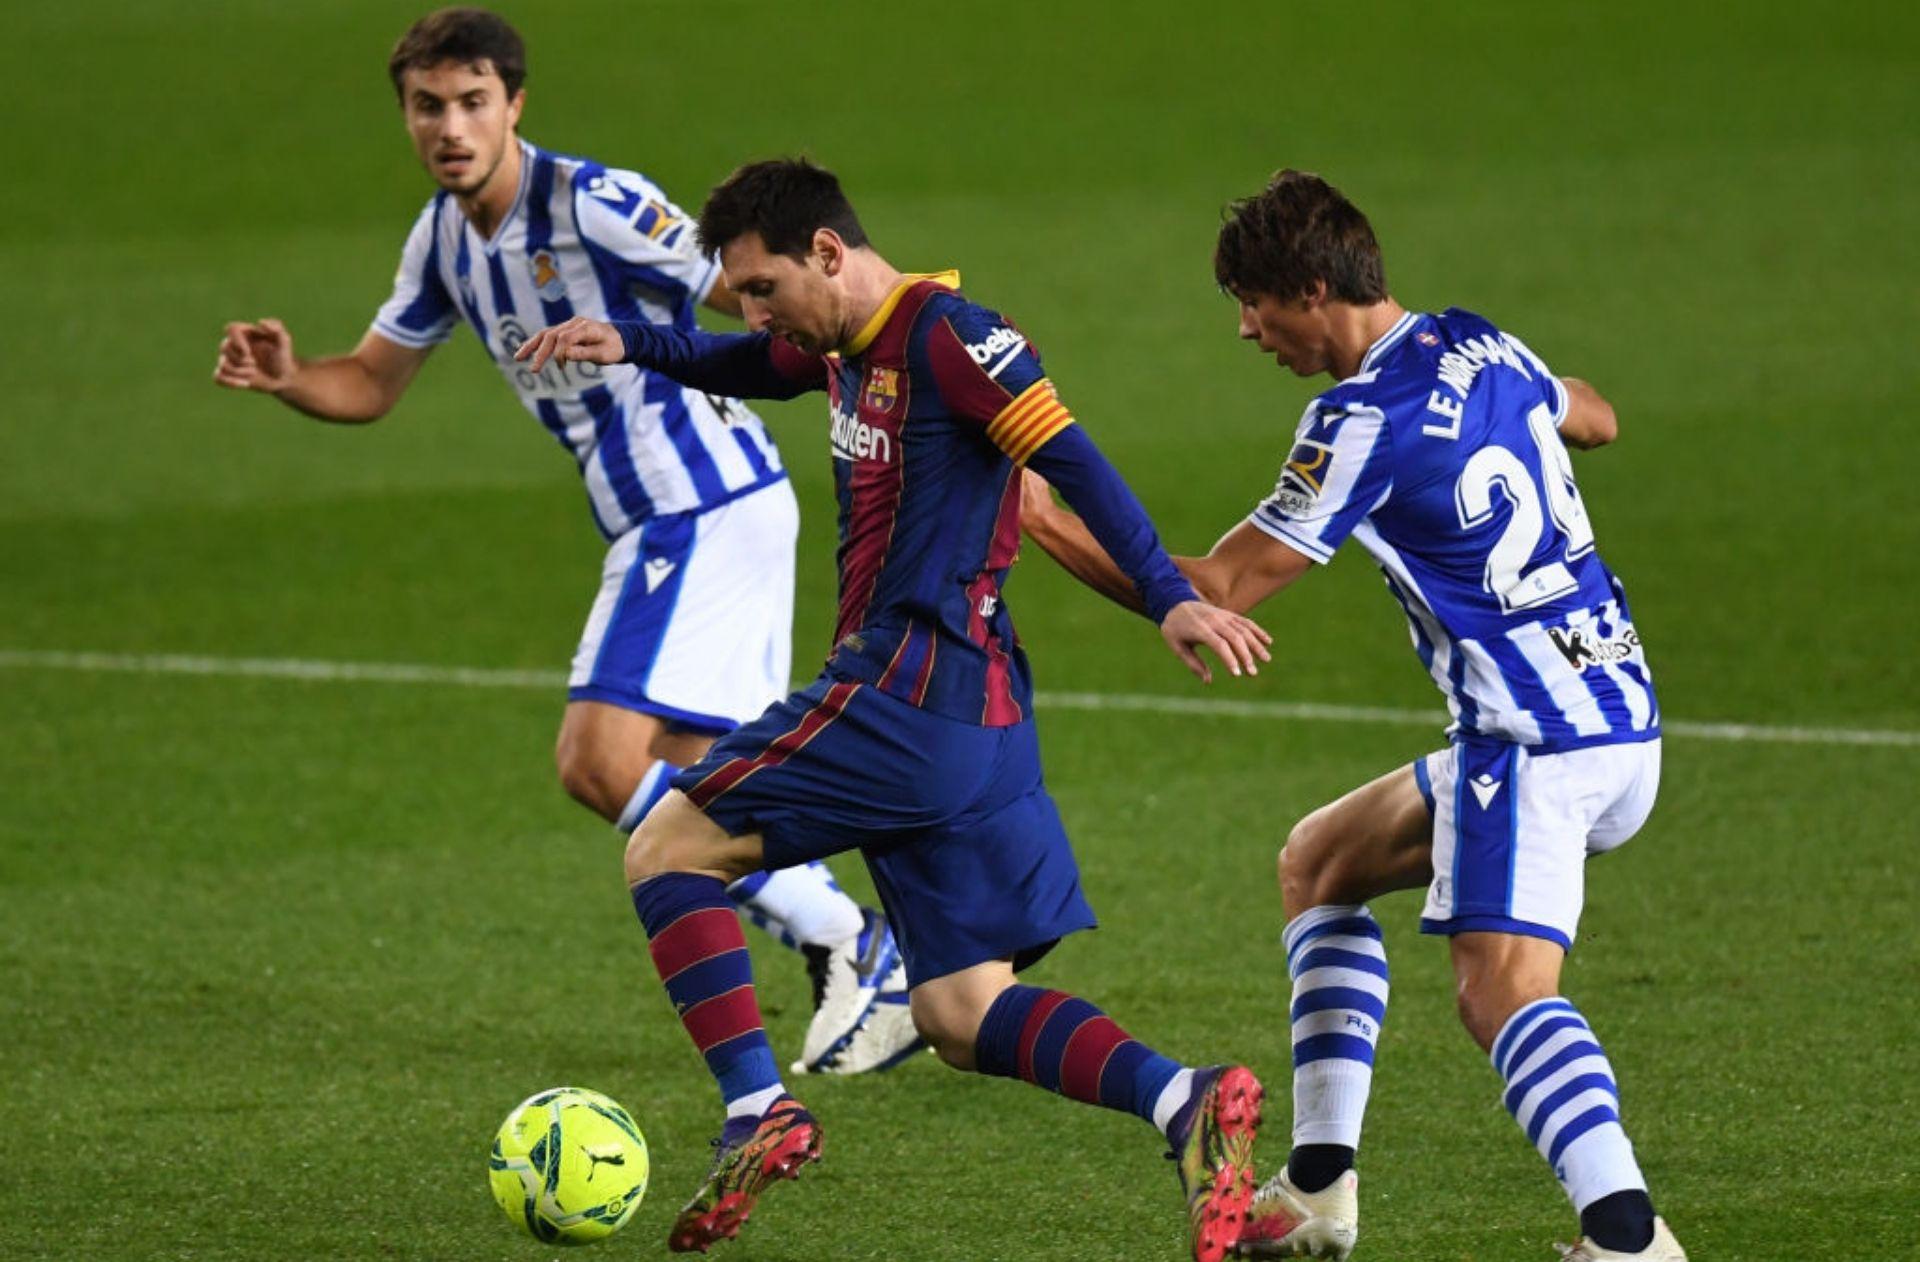 Real Sociedad vs FC Barcelona: Preview, Betting Tips, Stats & Prediction